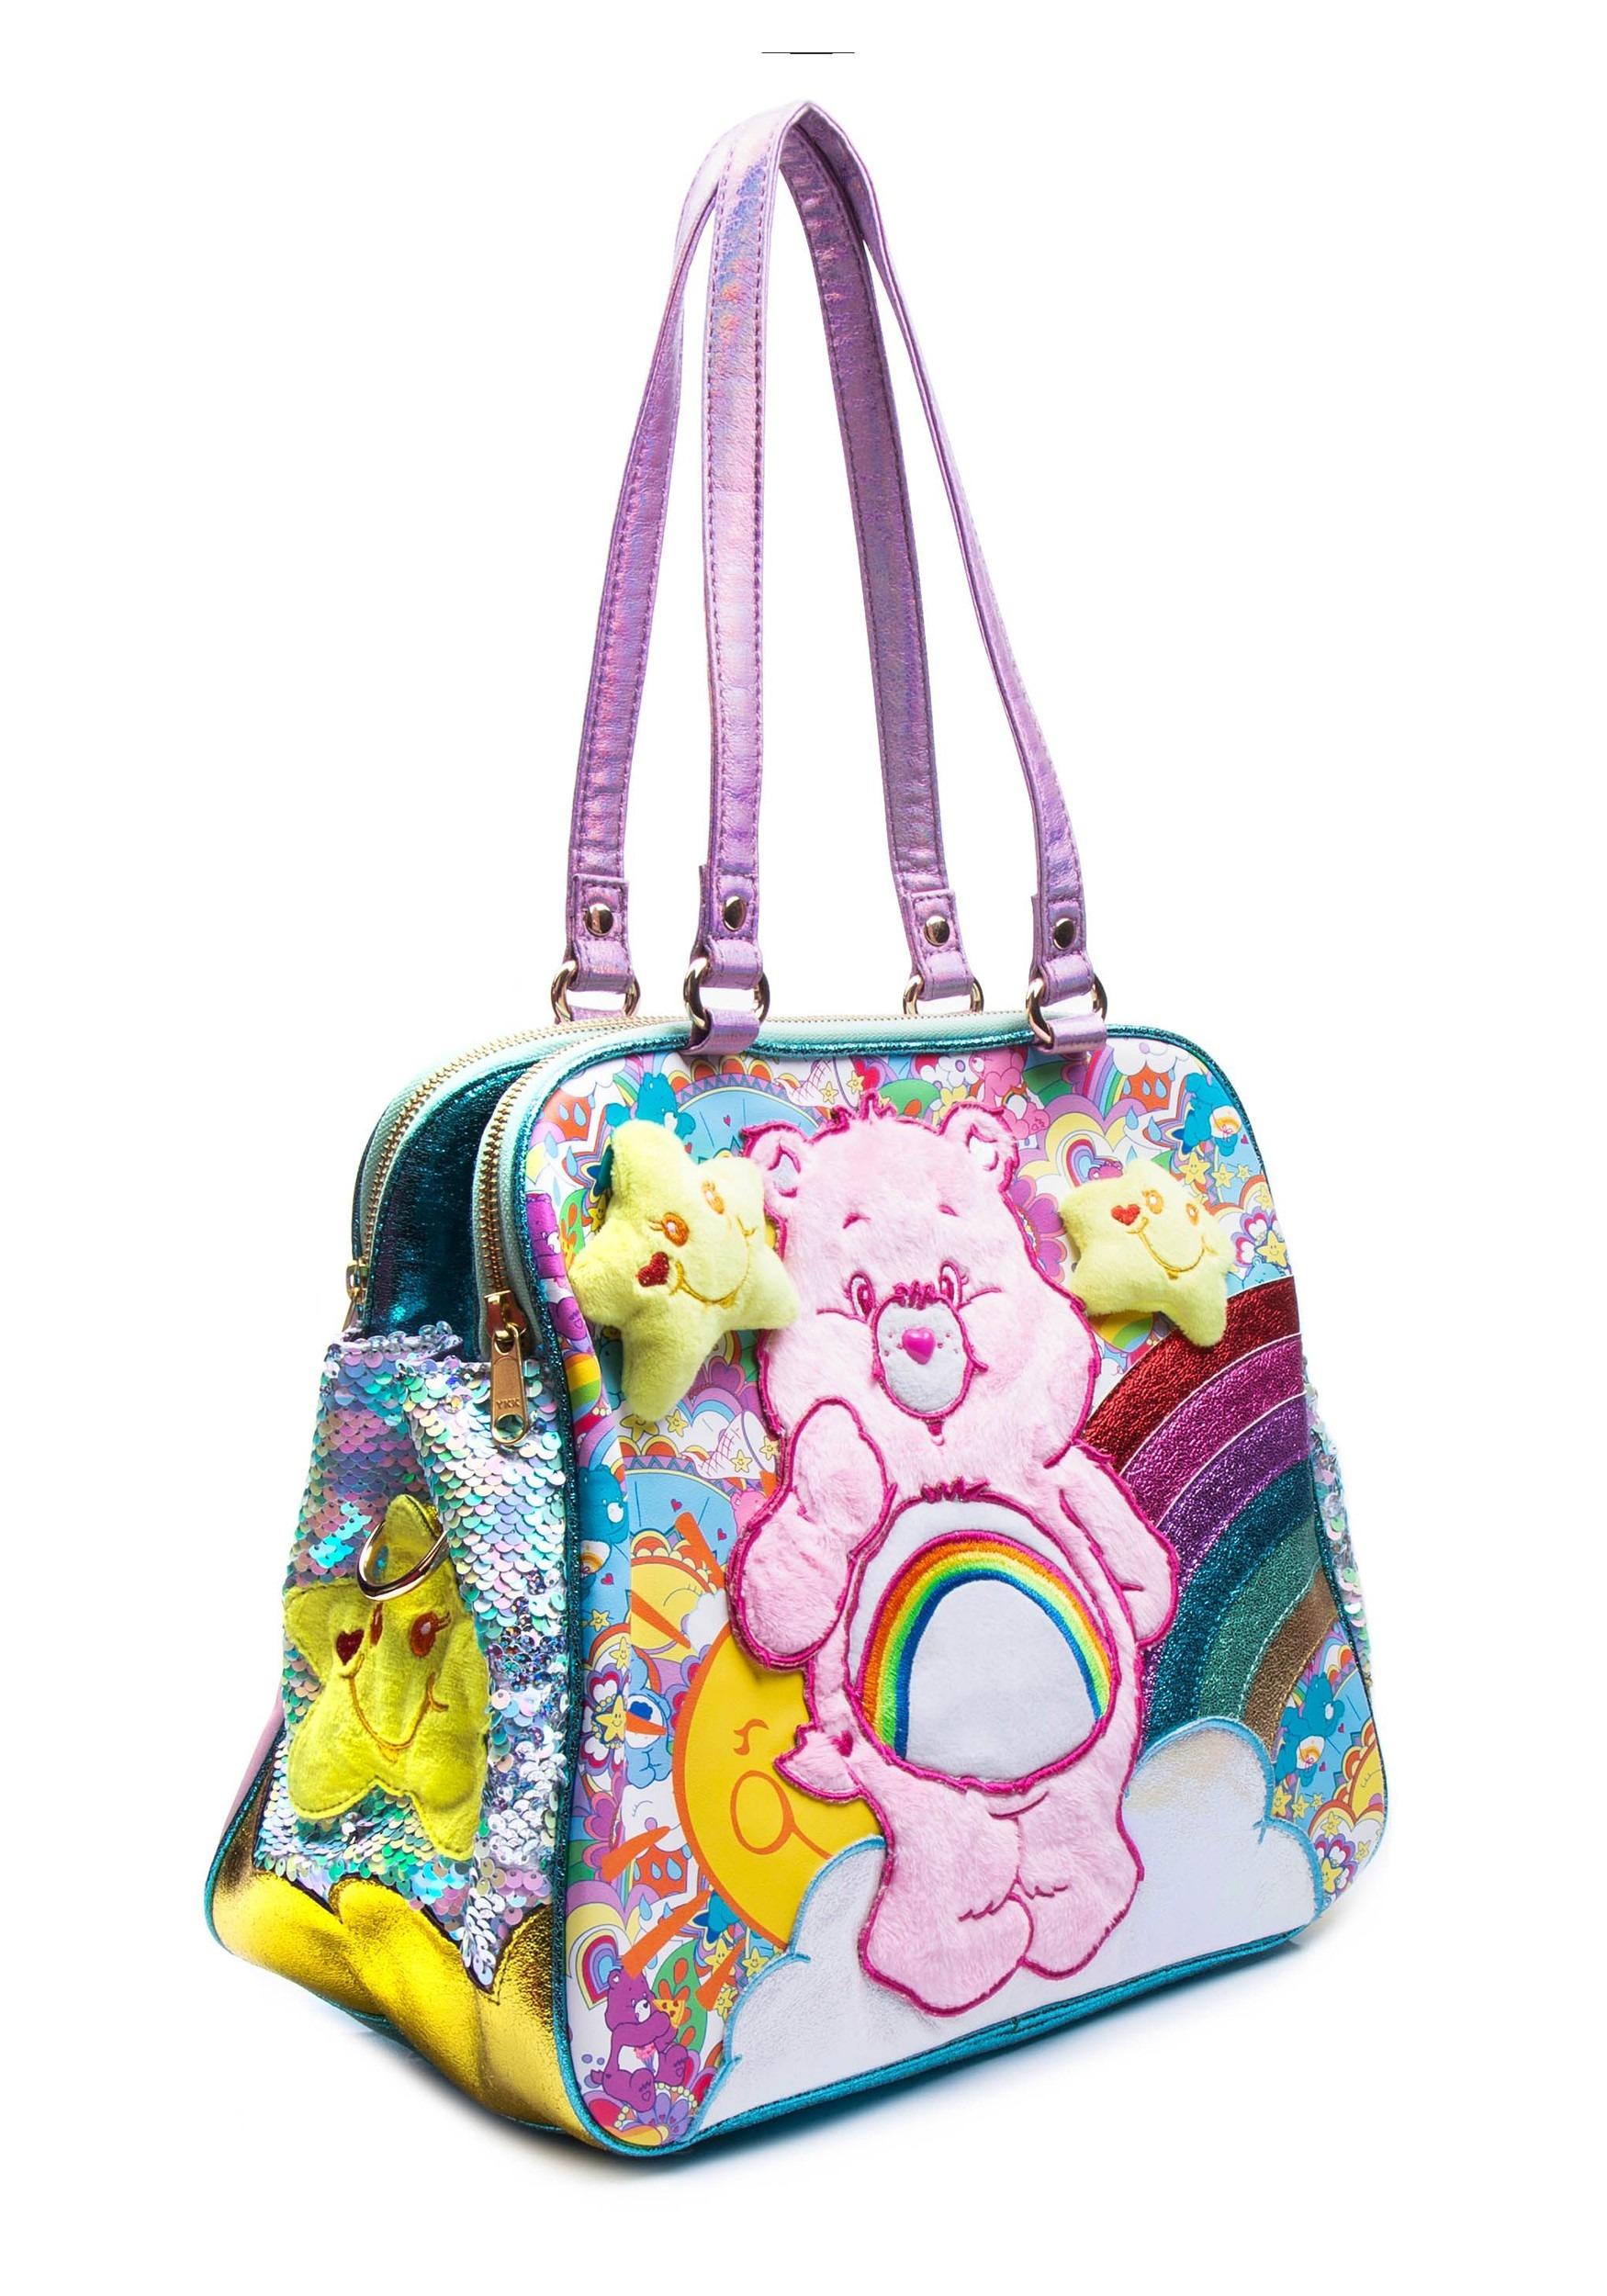 Care Bears Irregular Choice 100% Huggable Handbag